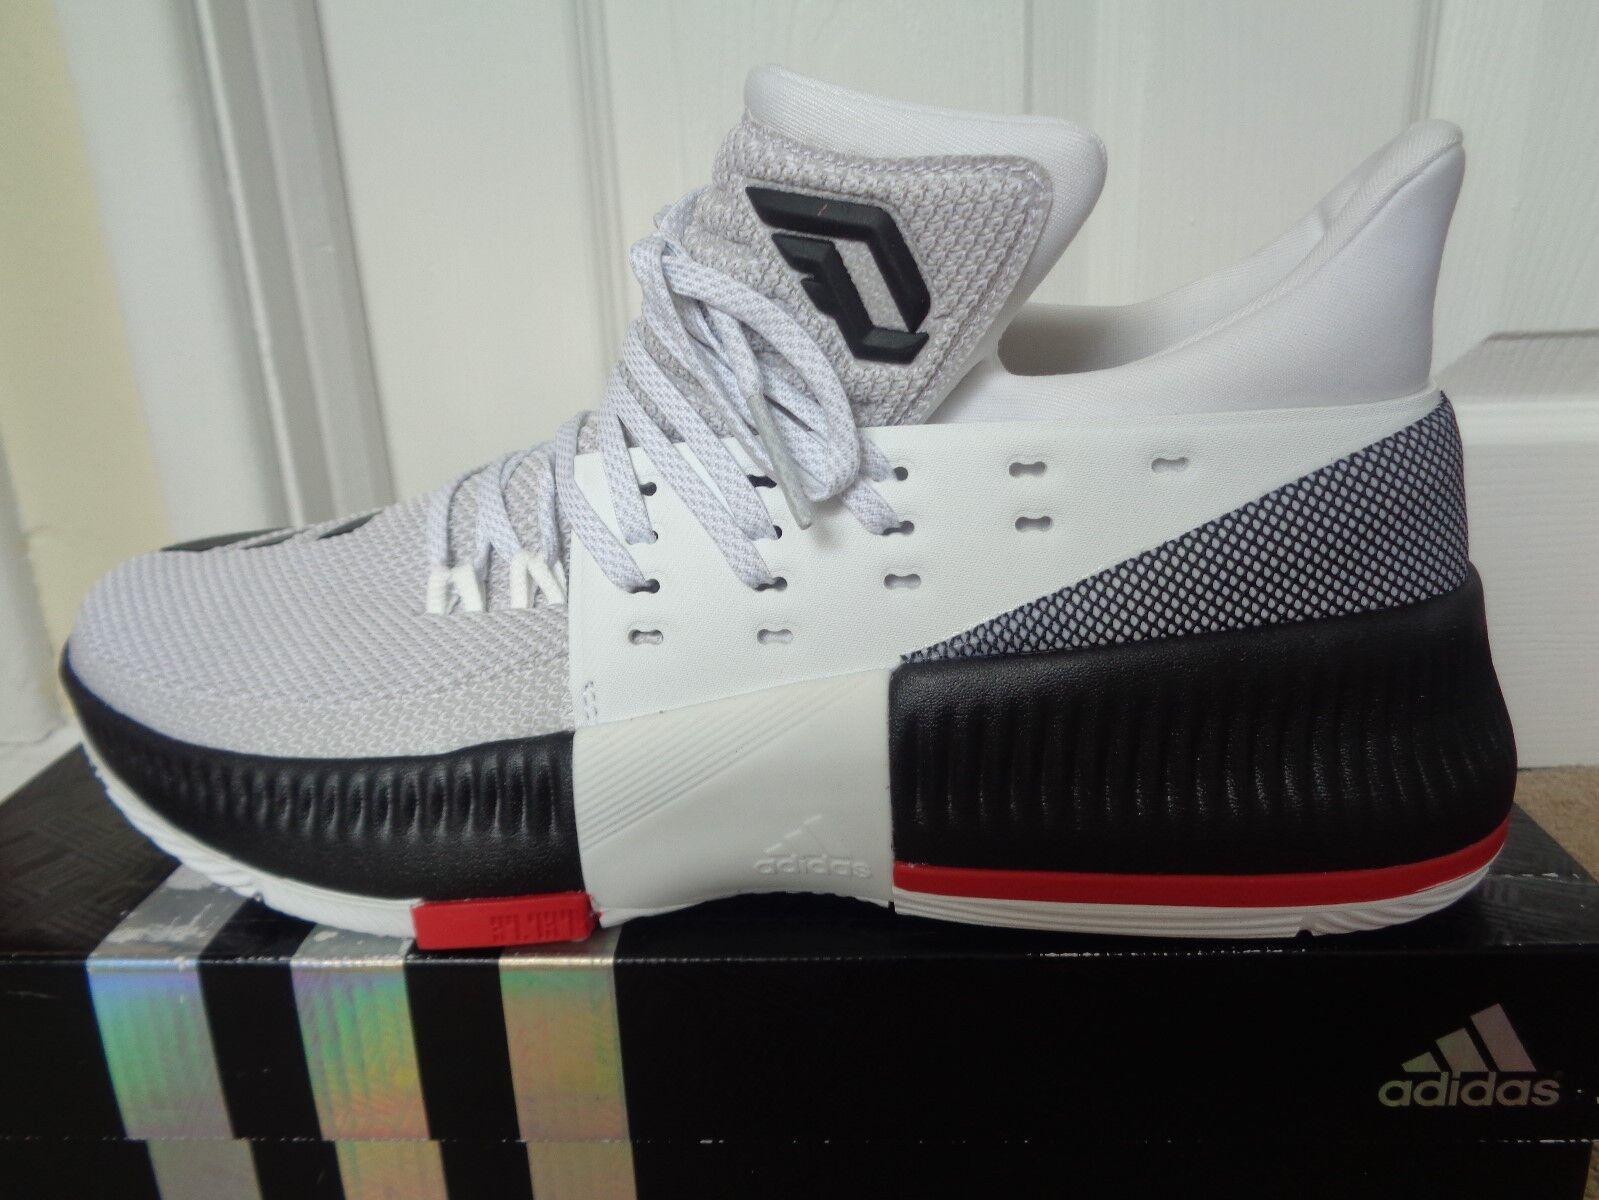 Adidas D D D Lillard 3 EntraineHommest Baskets Chaussures BB8268 3 US Neuf  Bote 2fee3c